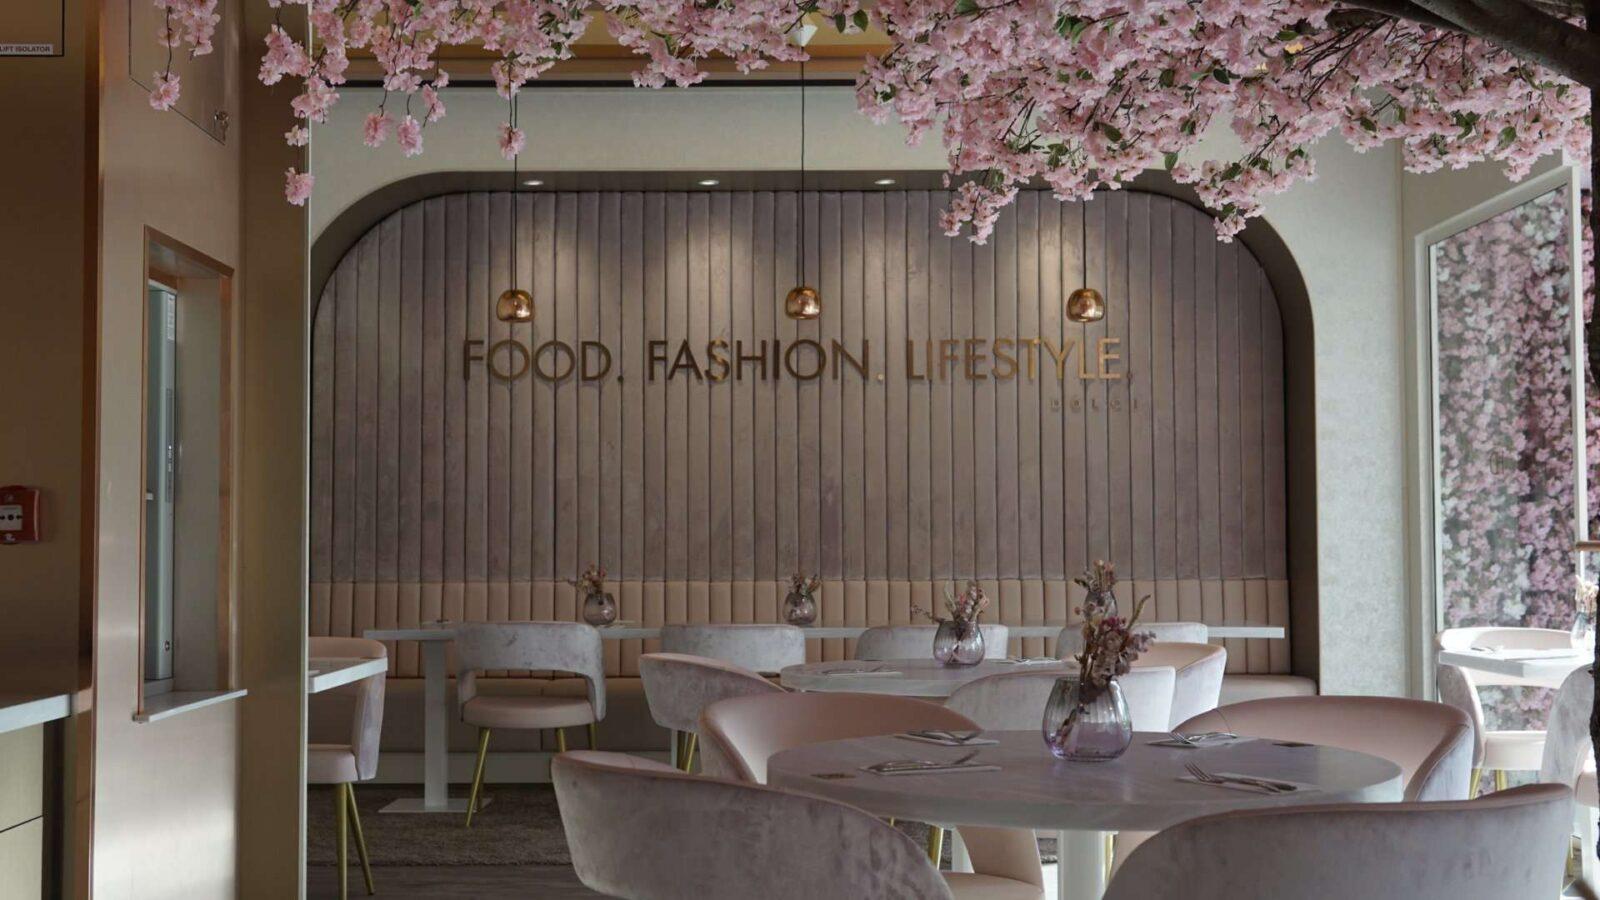 Food, Fashion & Lifestyle